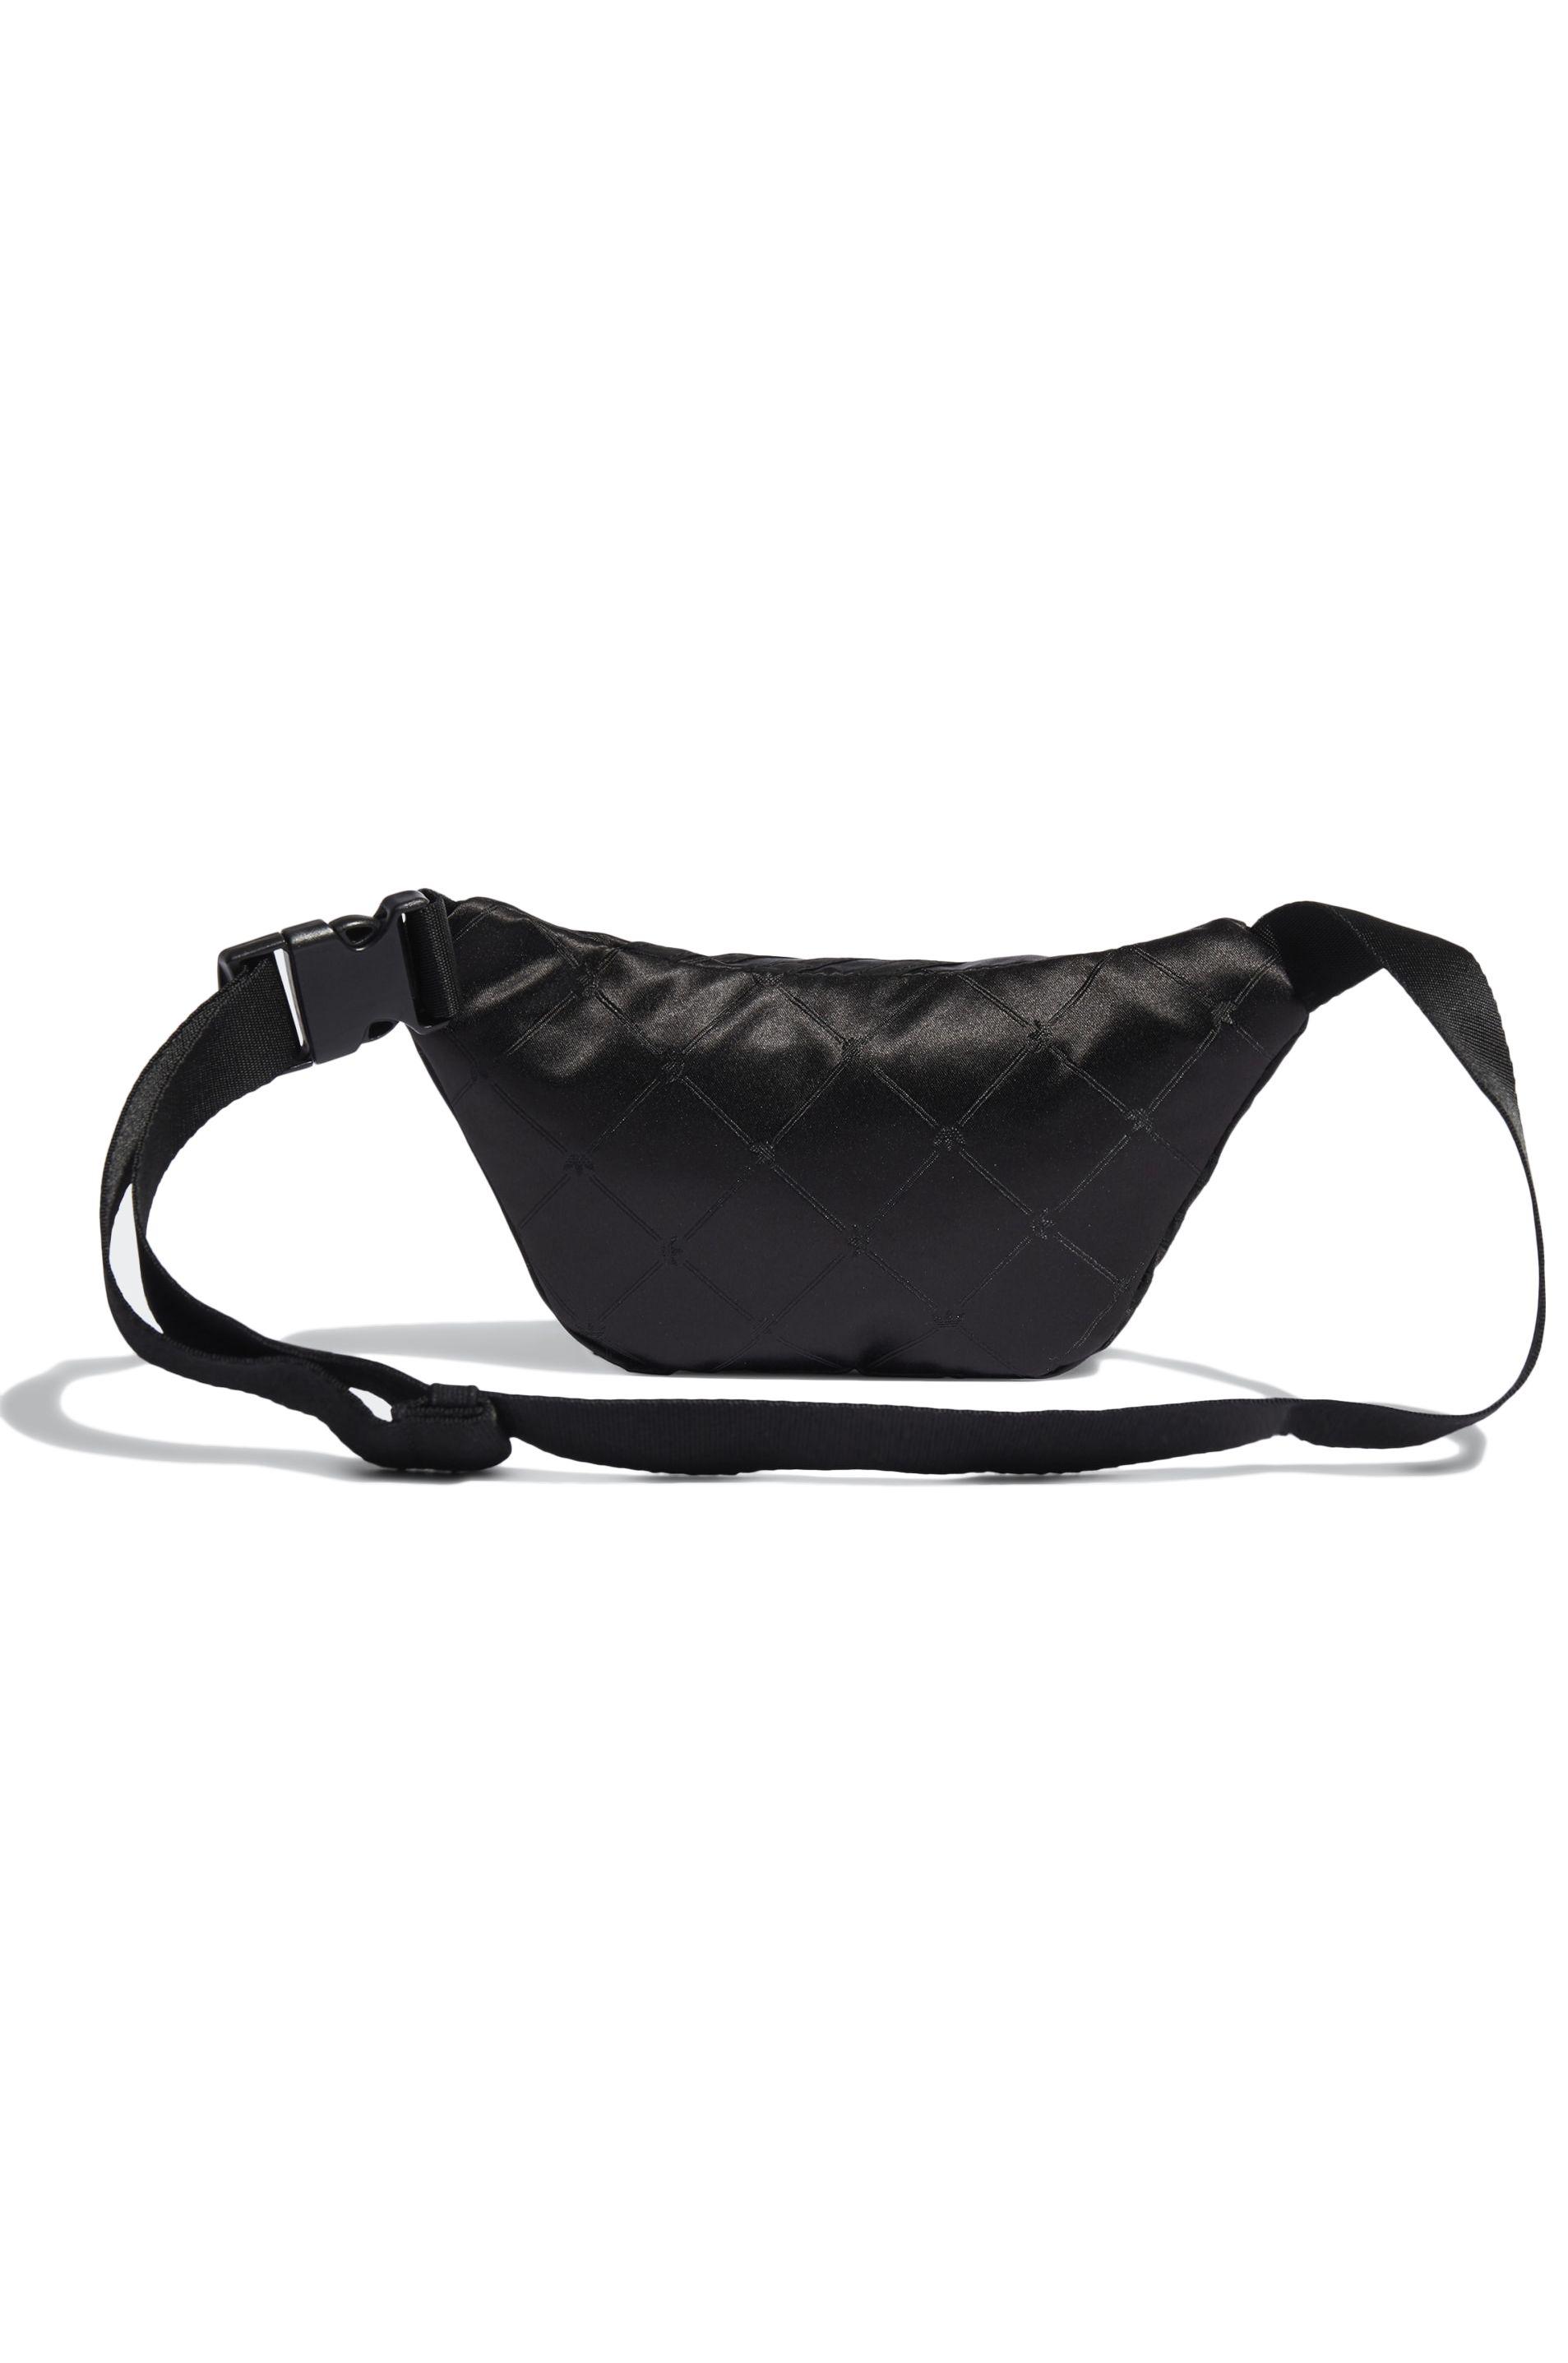 Adidas Waist Bag WAISTBAG NYLON Black